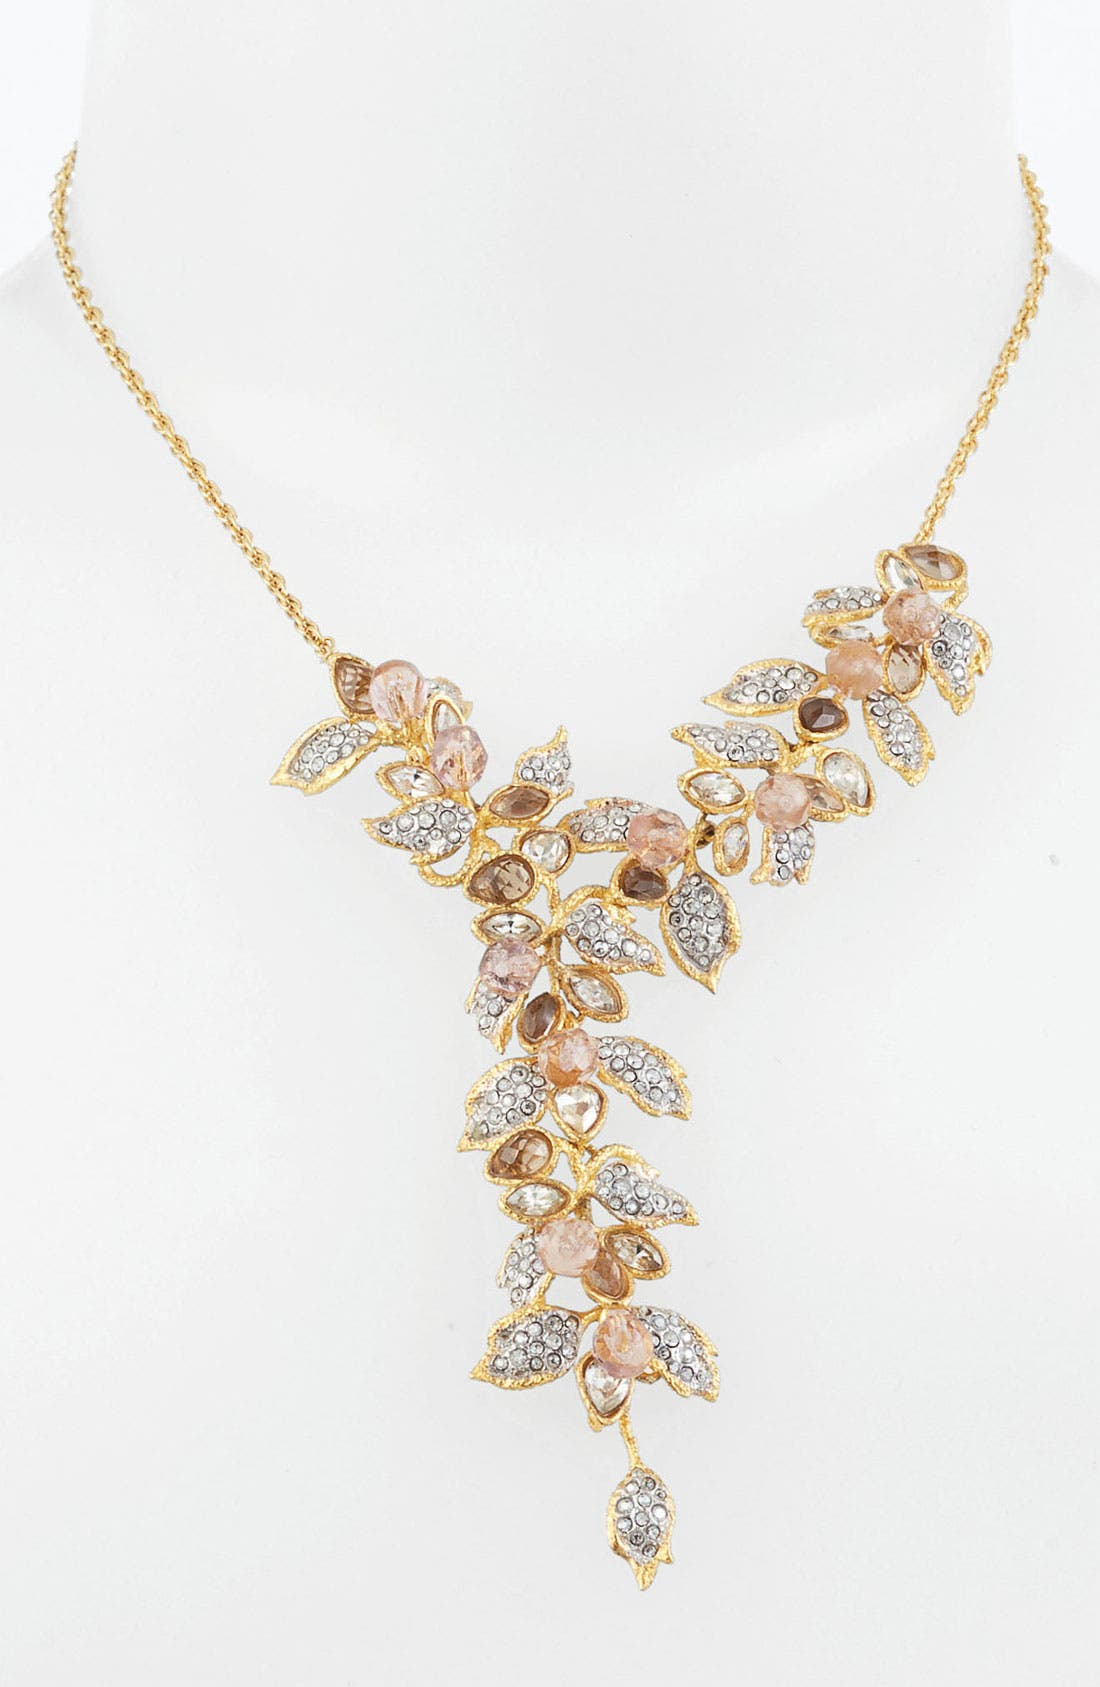 Main Image - Alexis Bittar 'Elements - Floral' Cascade Necklace